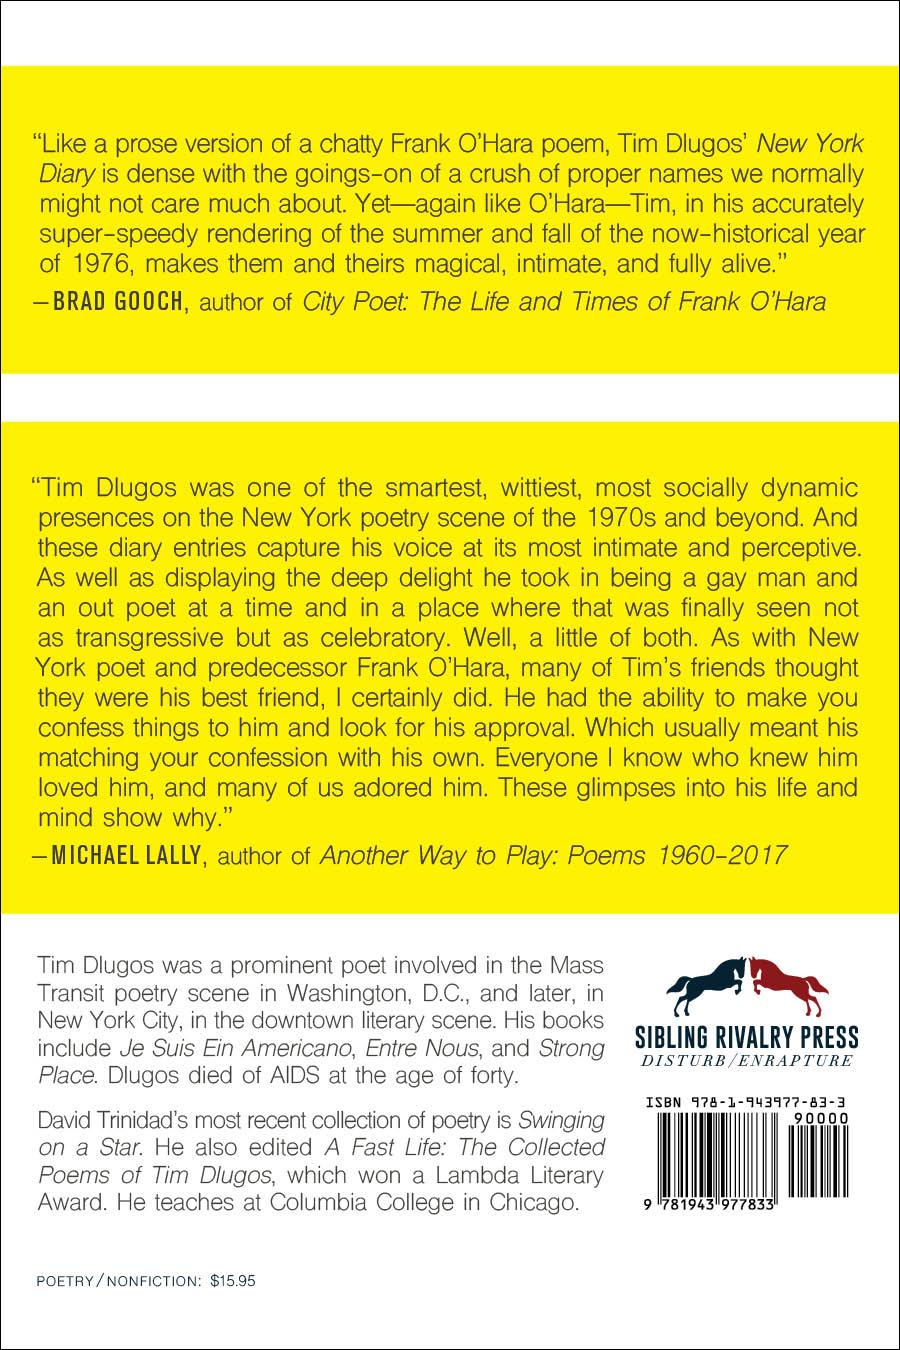 Image of New York Diary by Tim Dlugos, Edited by David Trinidad